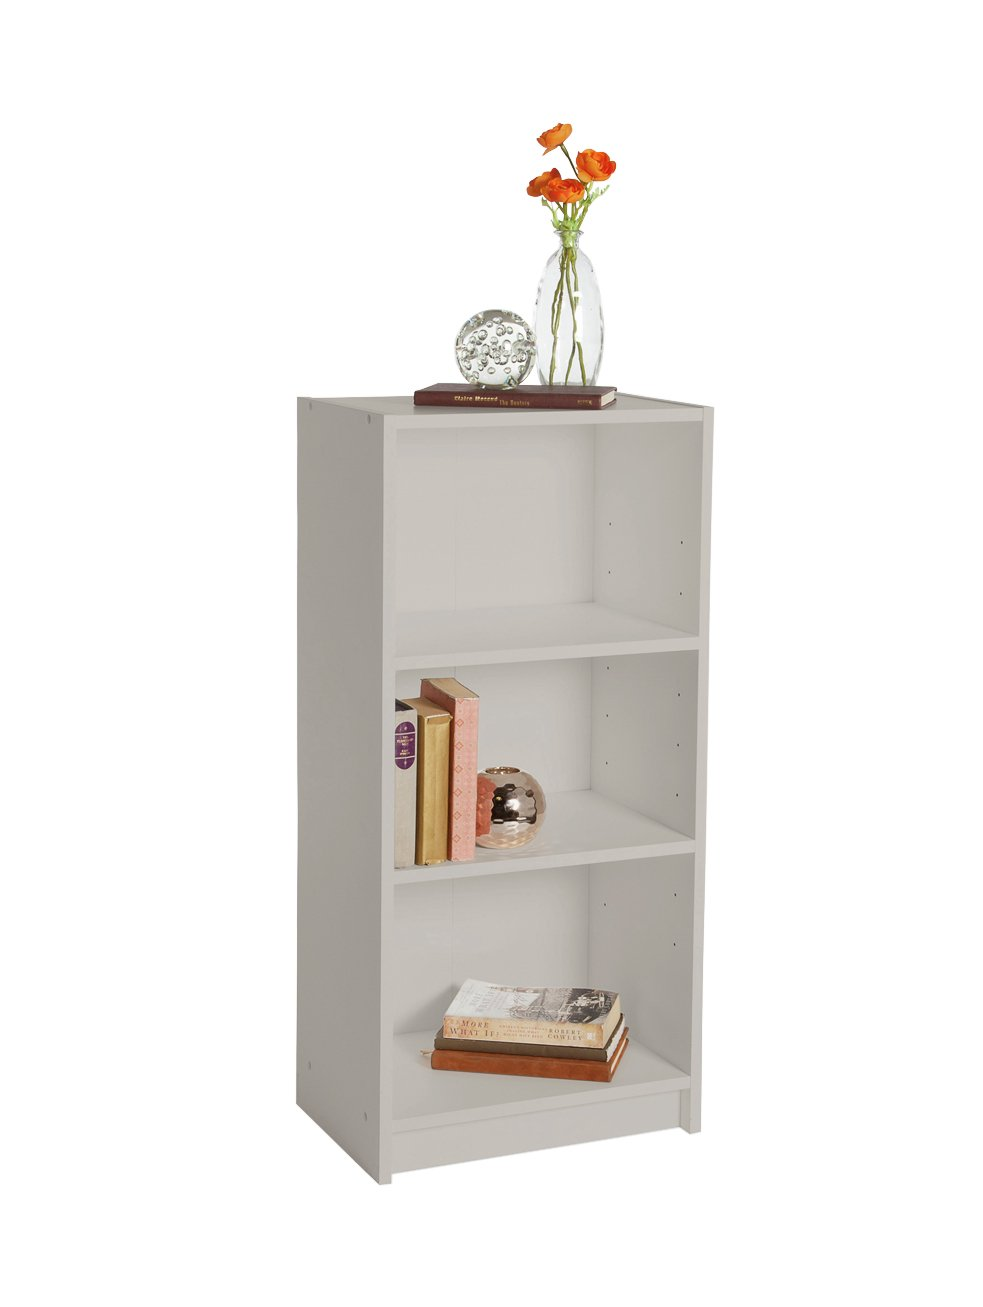 Argos Home Maine 2 Shelf Half Width Bookcase - Grey